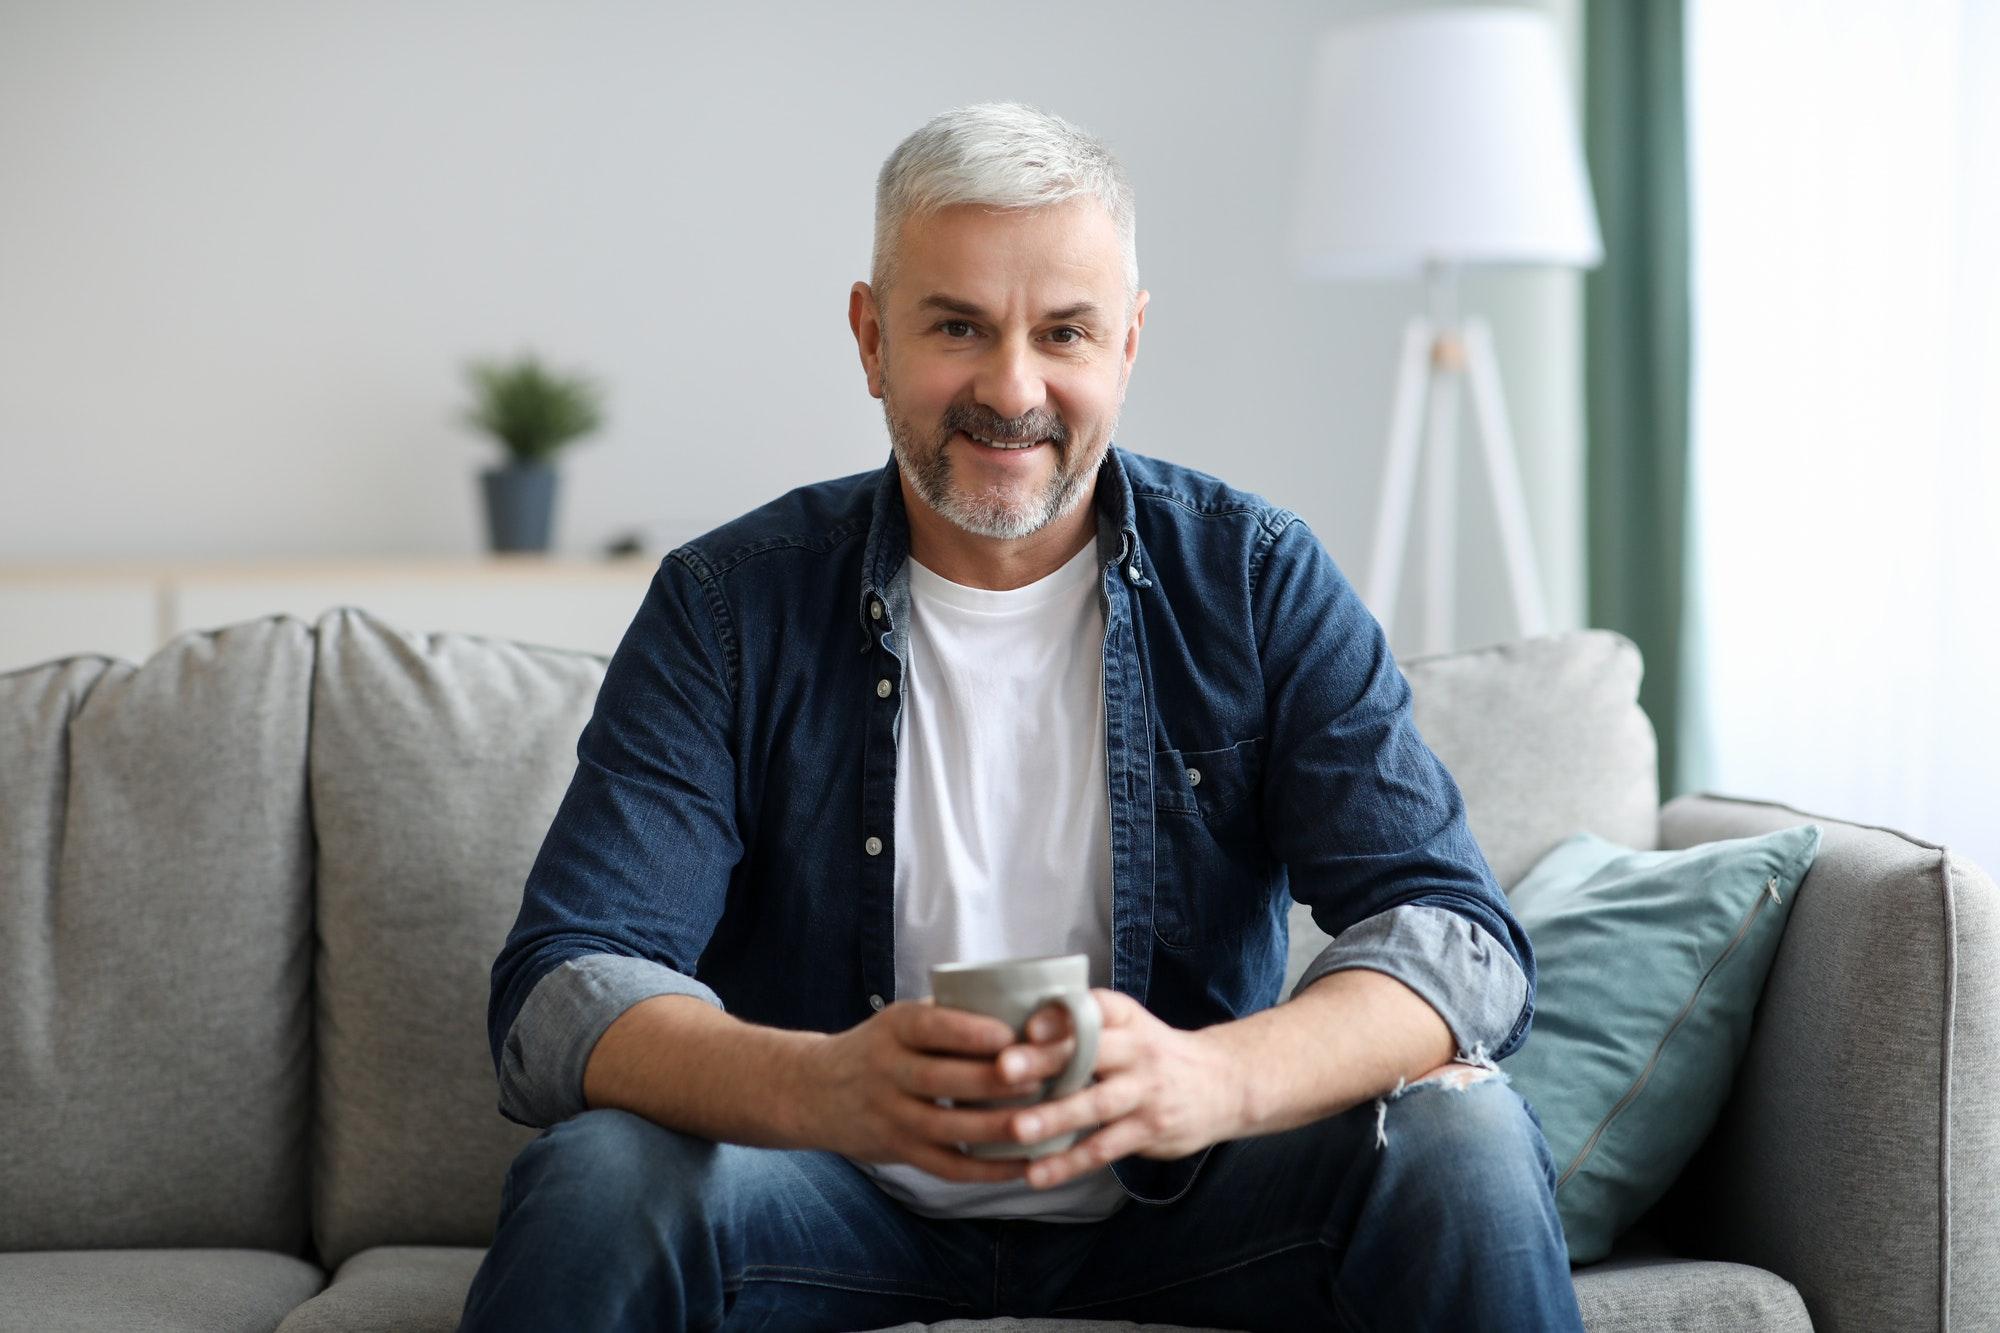 Cheerful senior man with mug of coffee